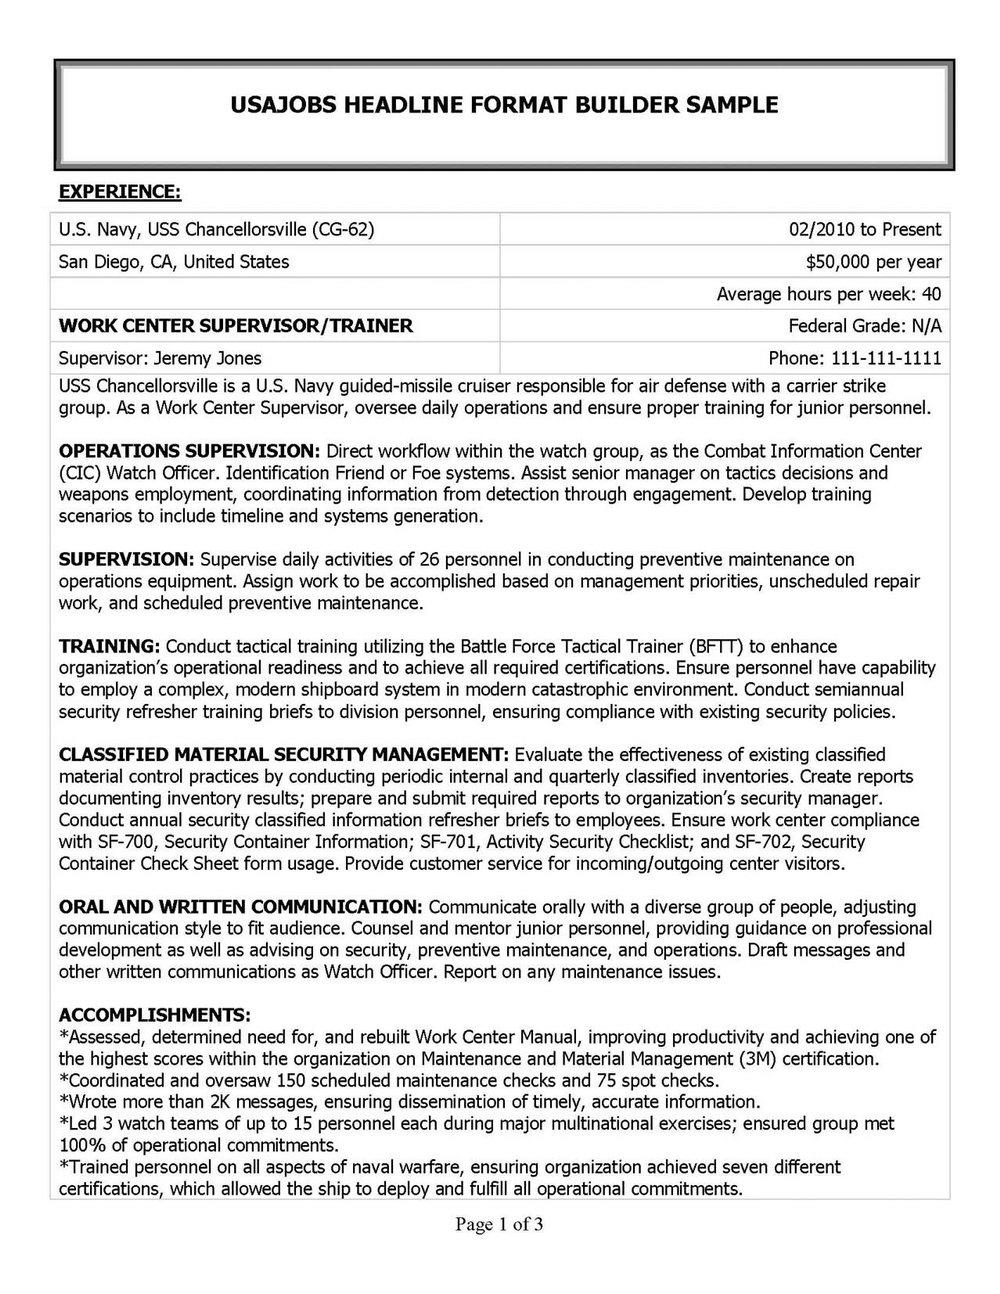 Certified Federal Resume Writer Certification Resumes